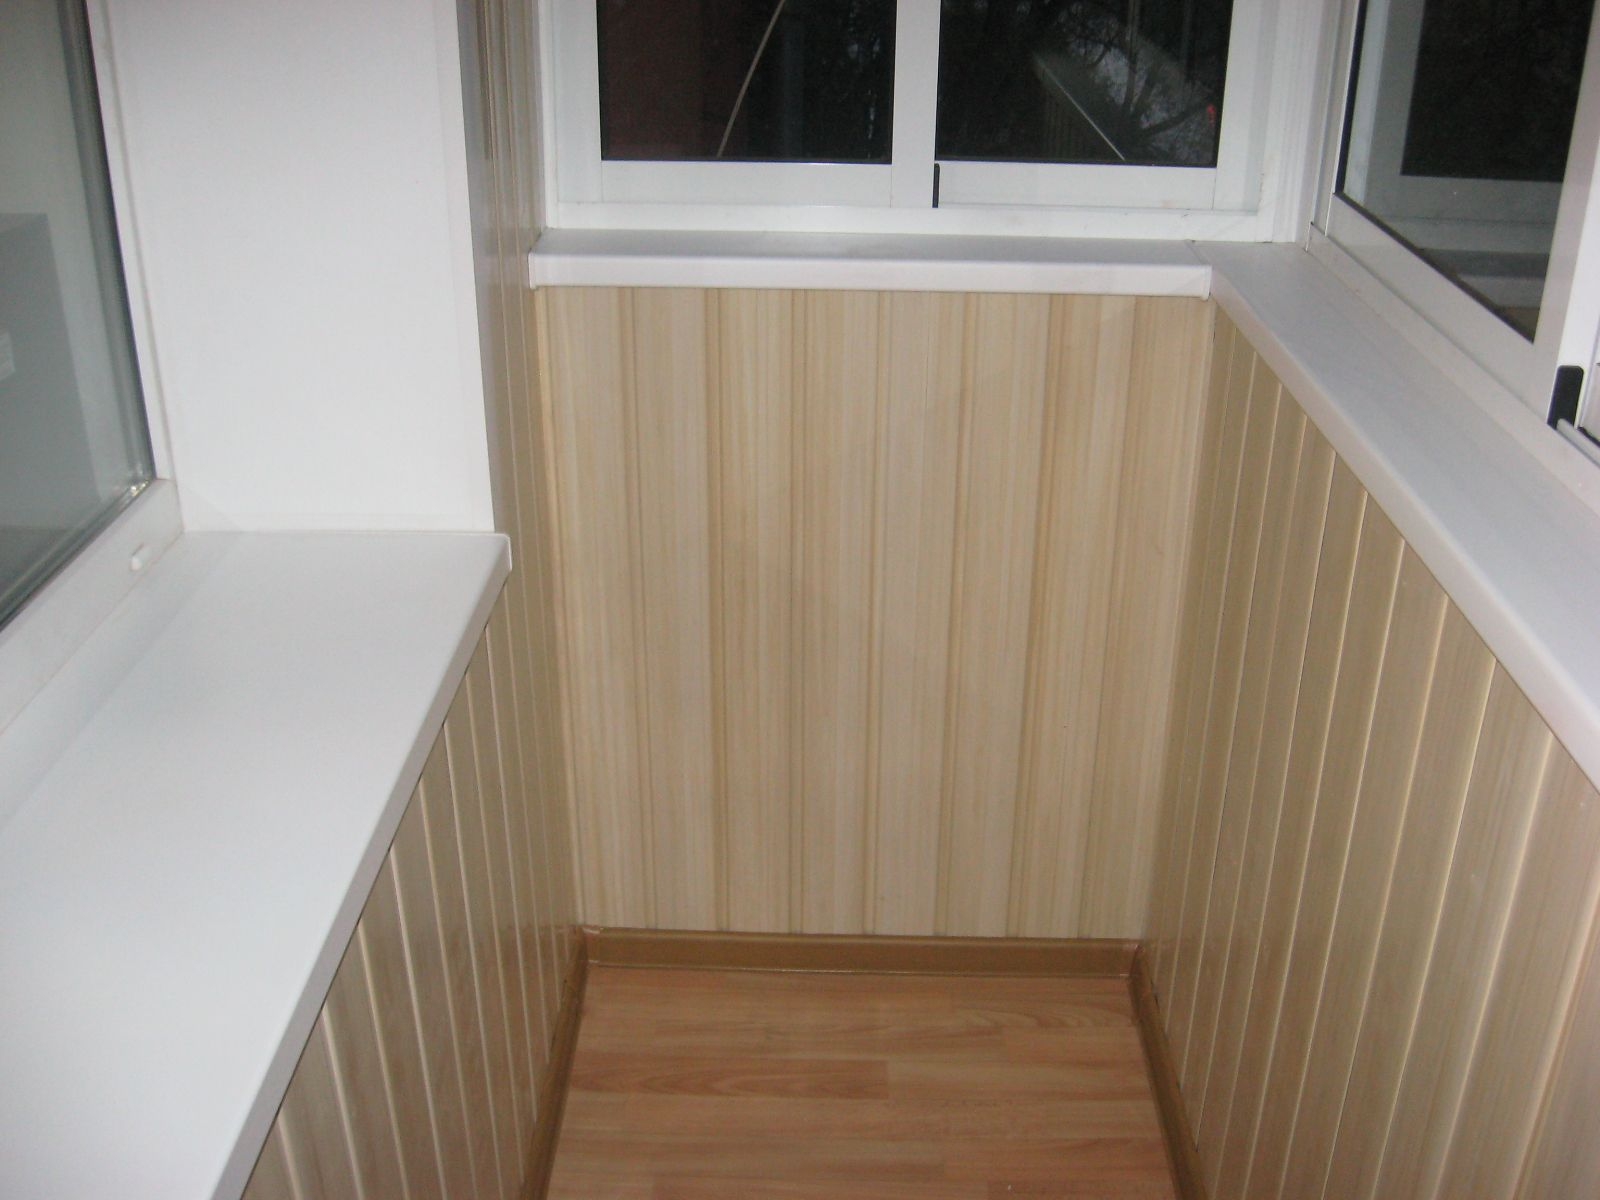 Обшивка балкона пвх вагонкой